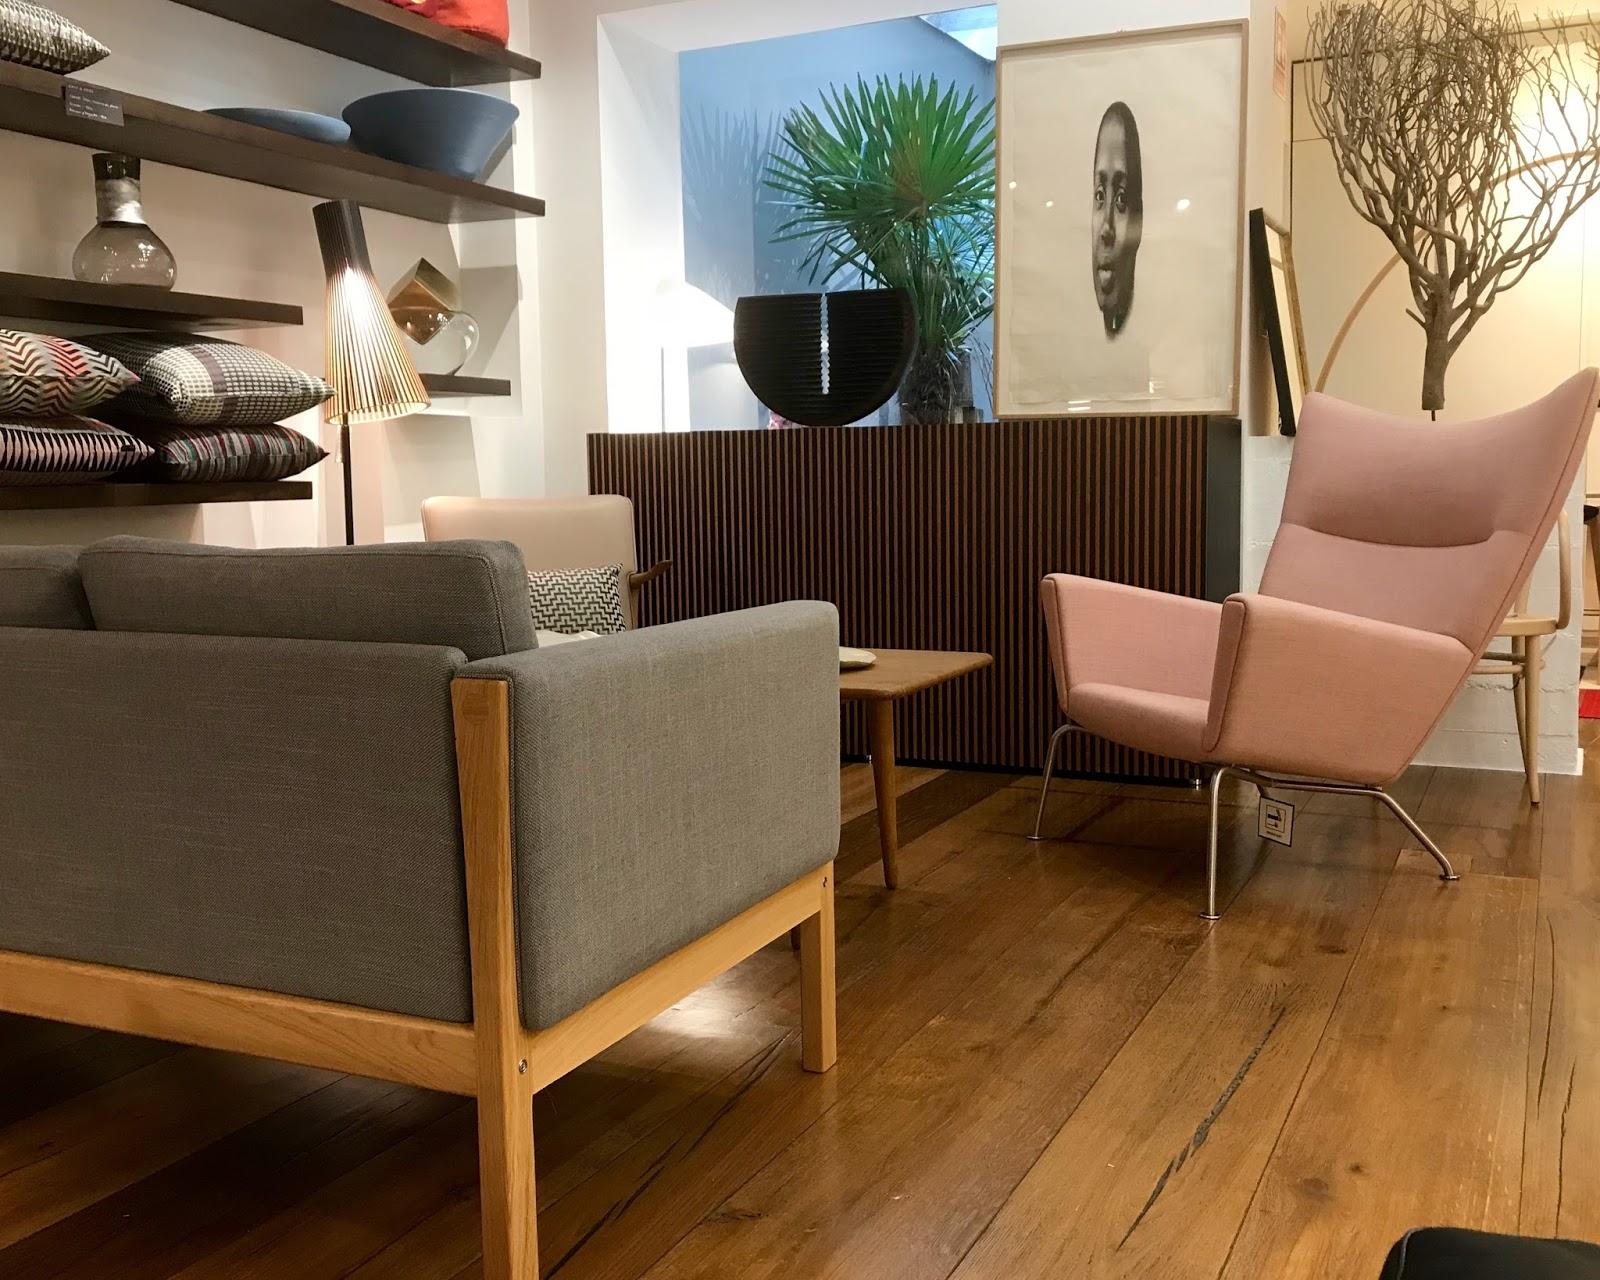 hans wegner sofa ch163 standard size in india carl hansen en exposicion chic soul ch162